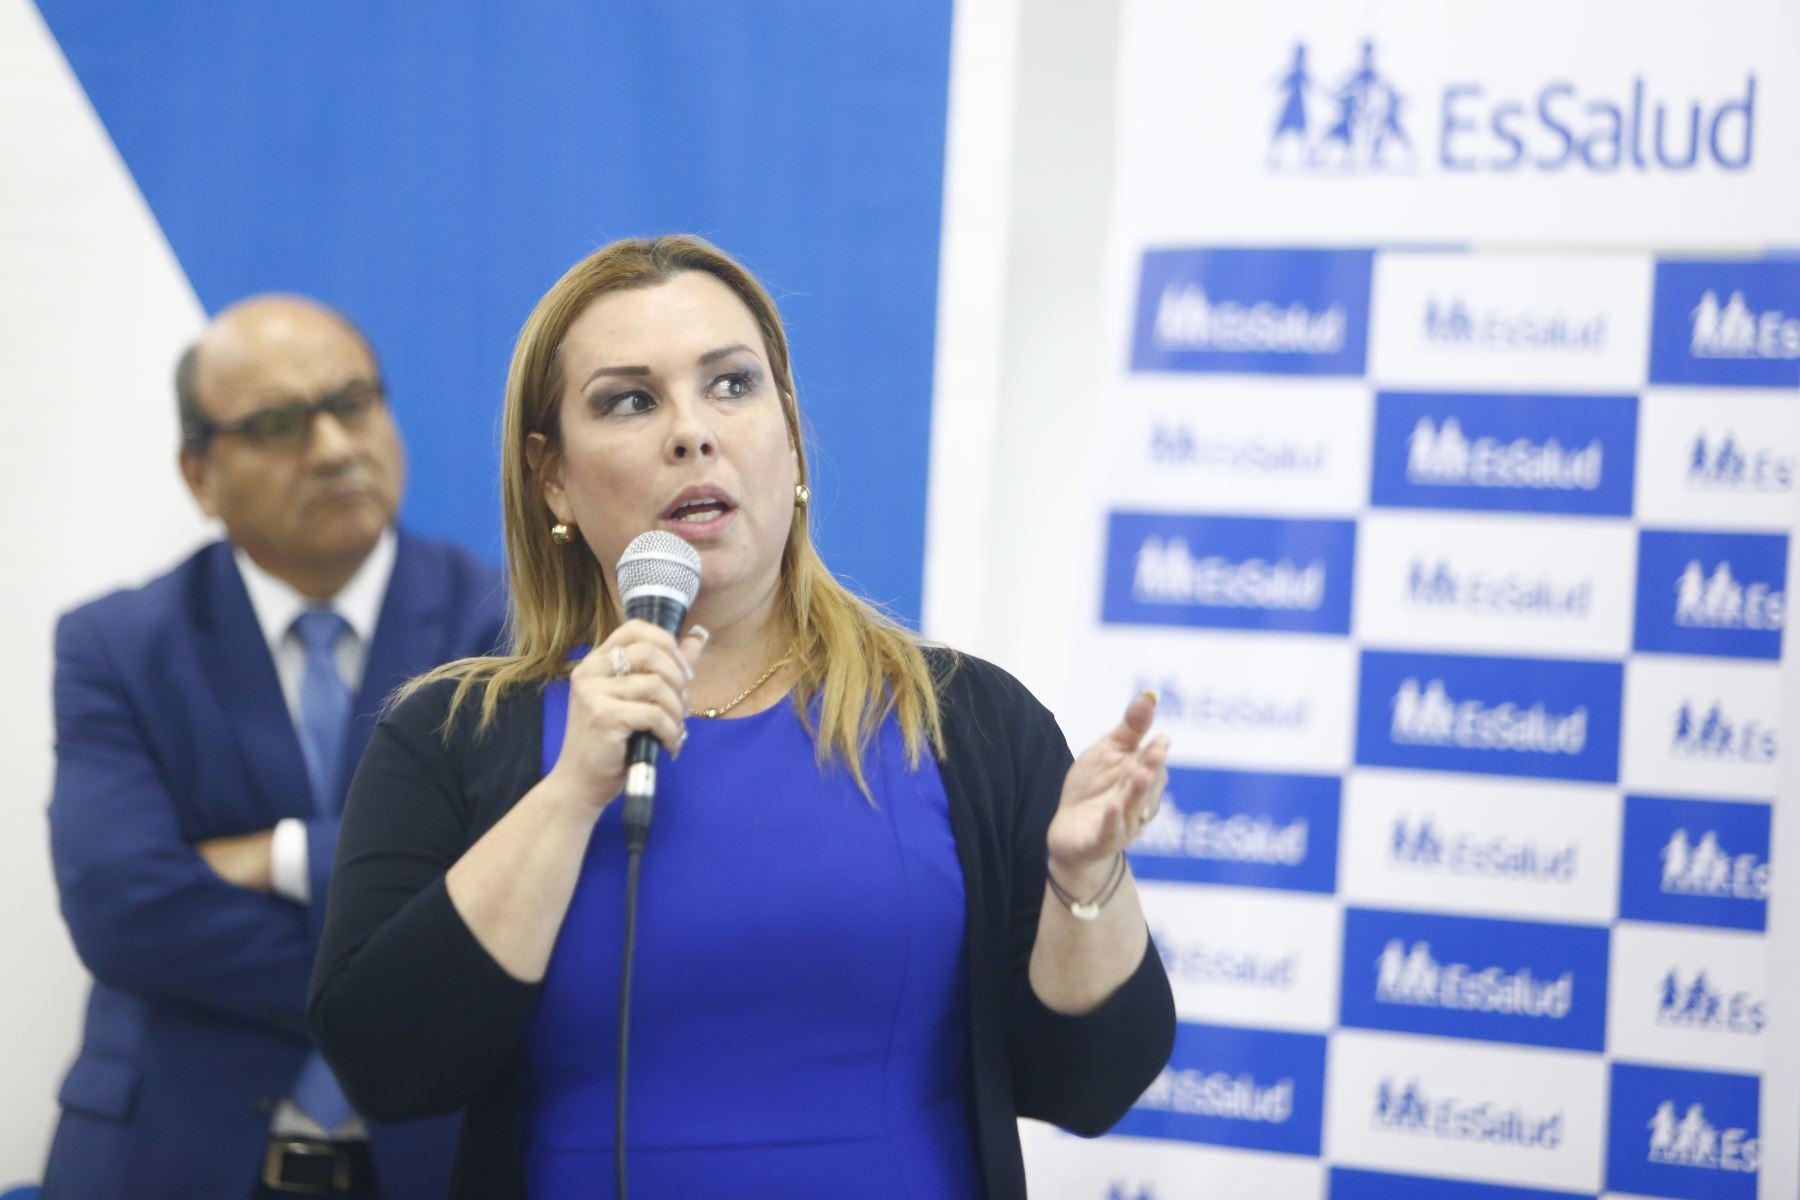 Fiorella Molinelli, presidenta de Essalud. Foto: ANDINA/Jhonel Rodríguez Robles